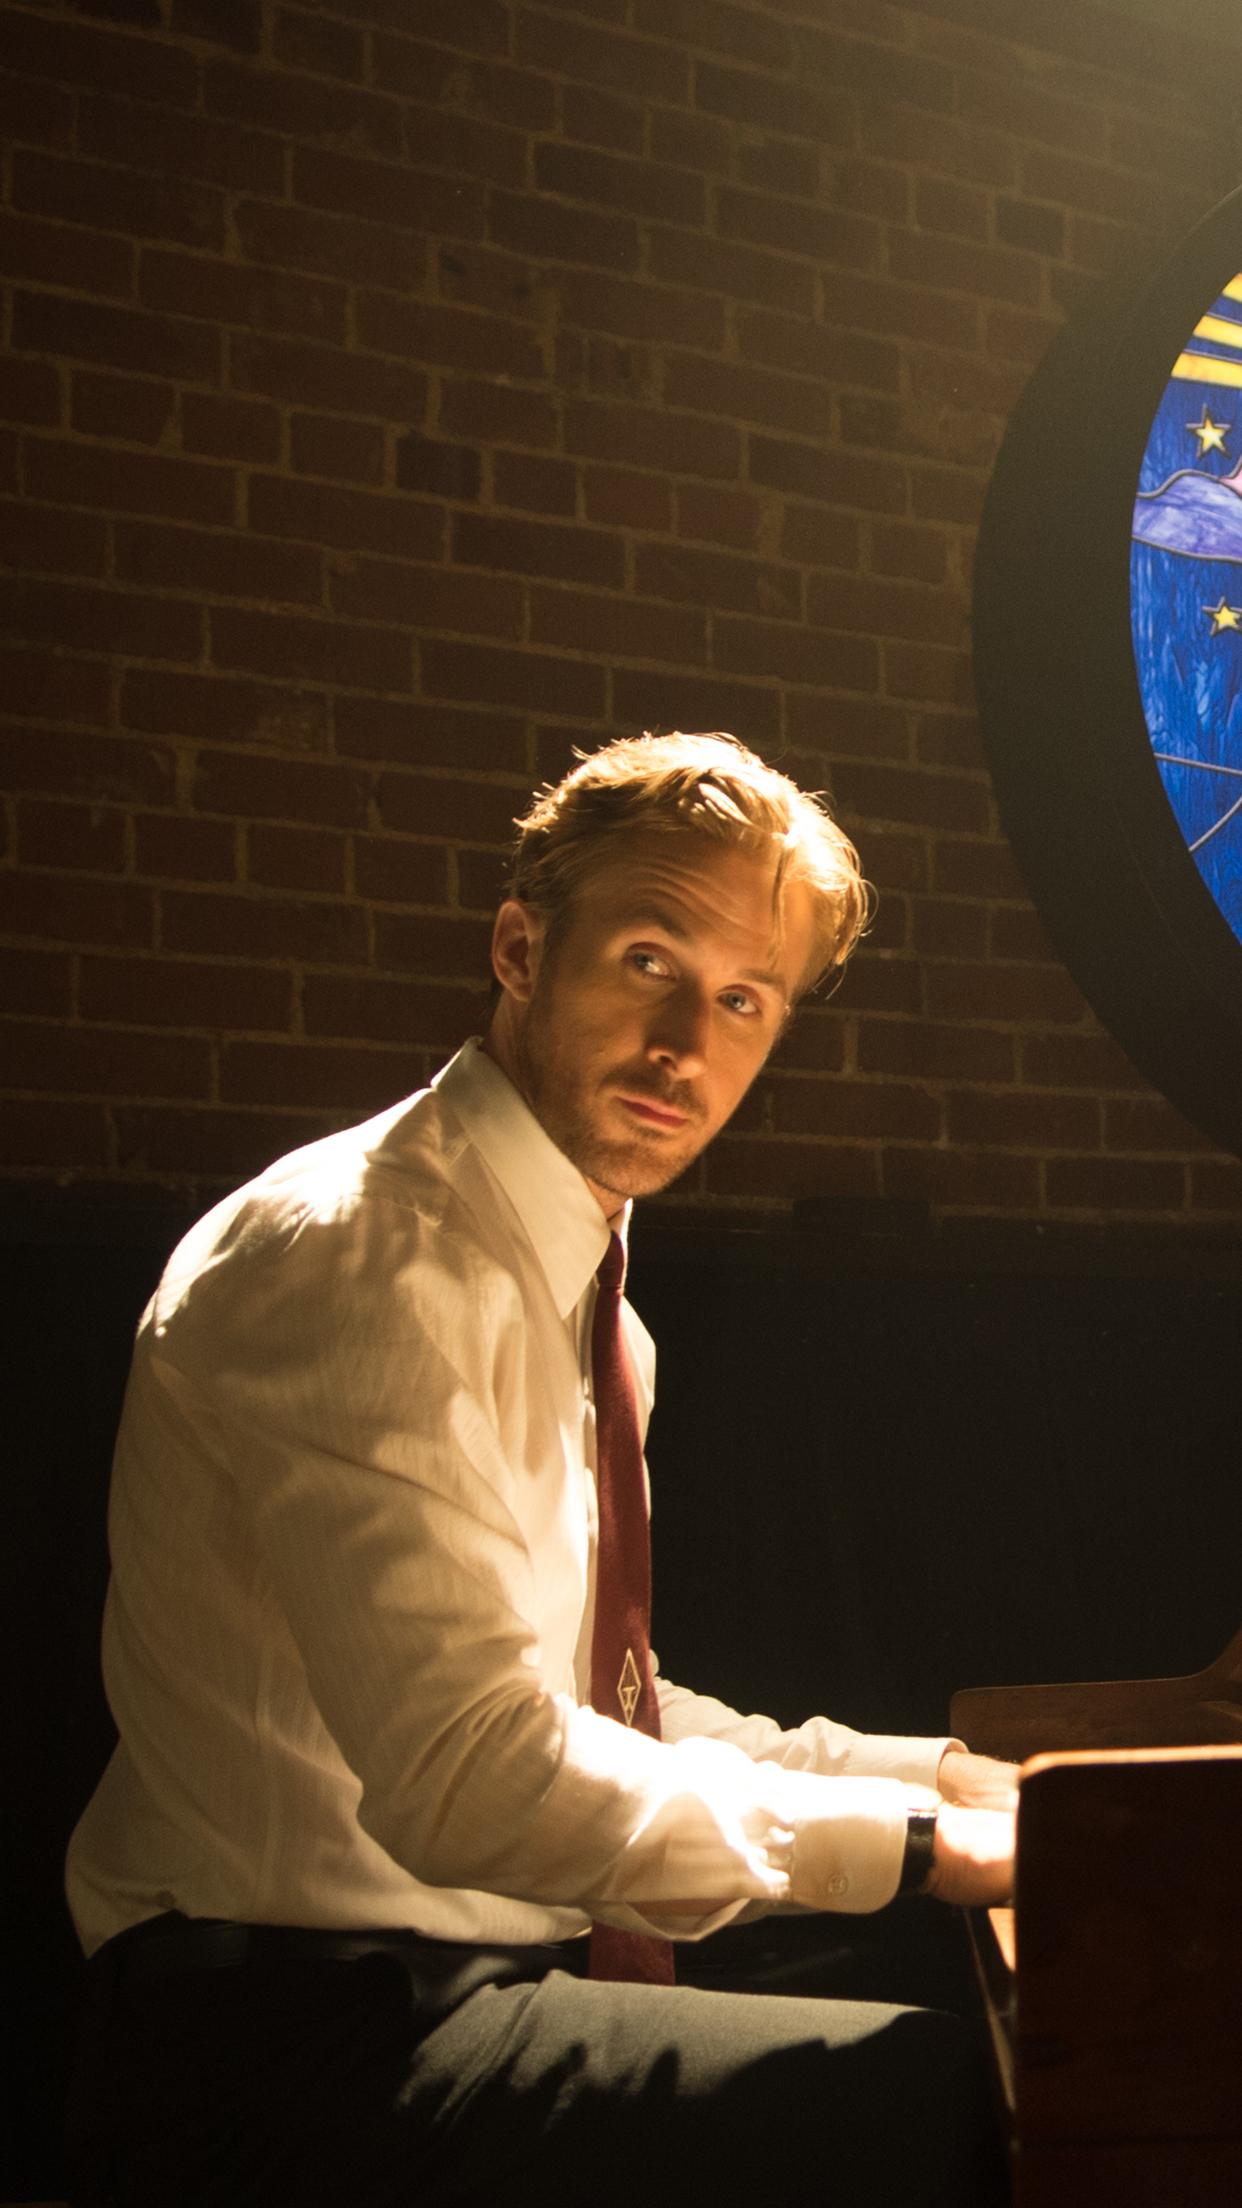 Wallpaper HD iPhone X, 8, 7, 6 - La La Land : Sebastian ... Ryan Gosling Piano